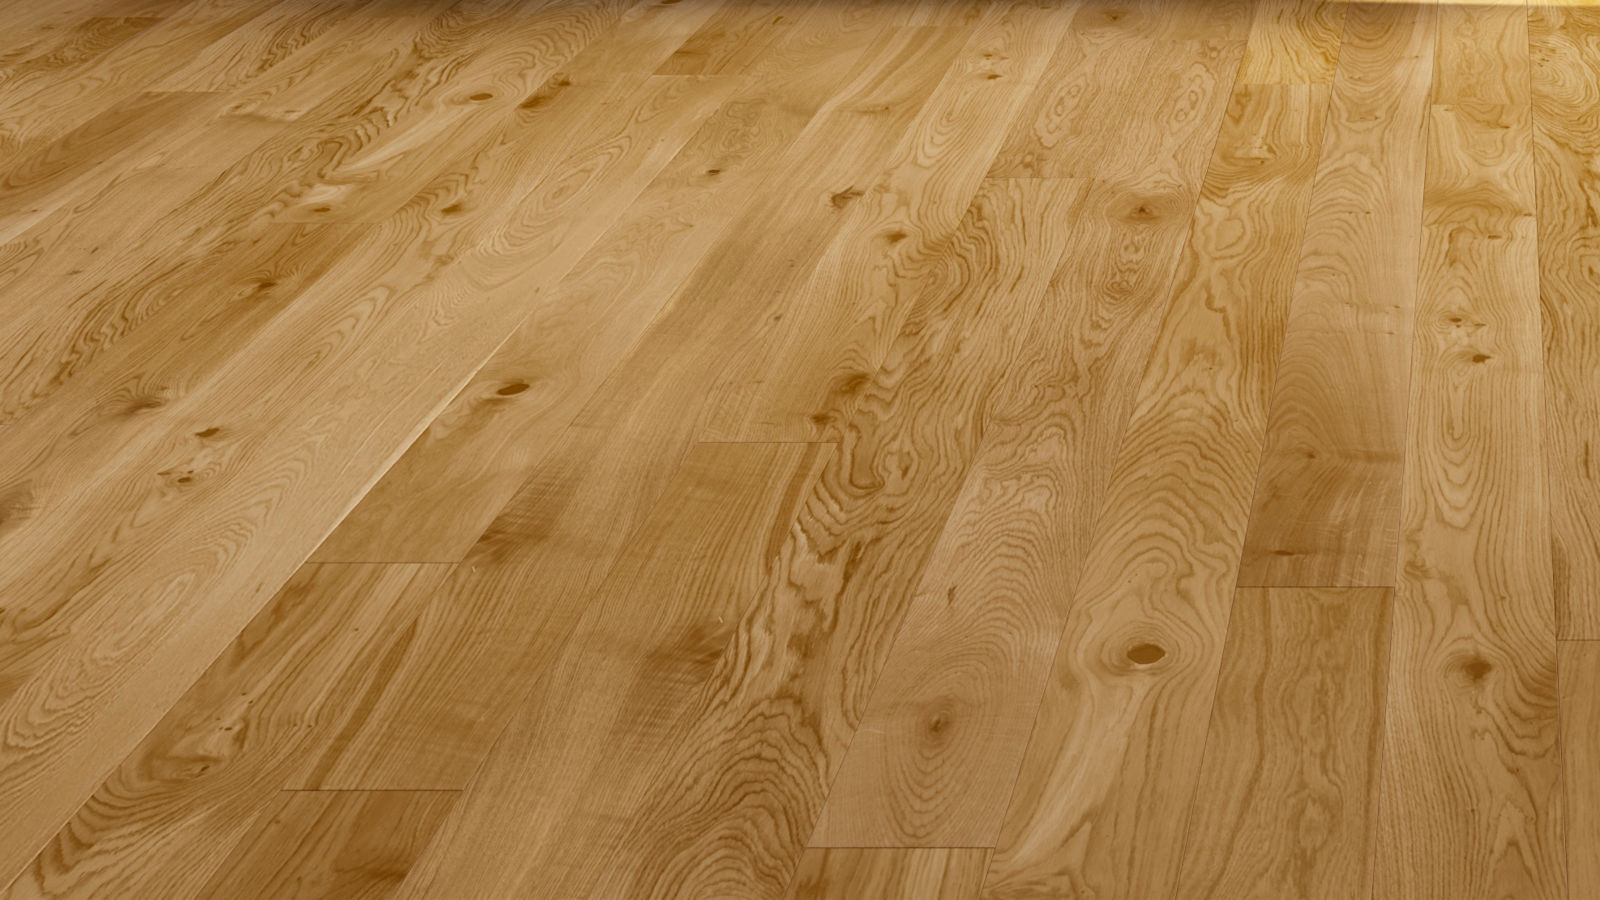 Natura oak wexford engineered wood flooring for Engineered wood